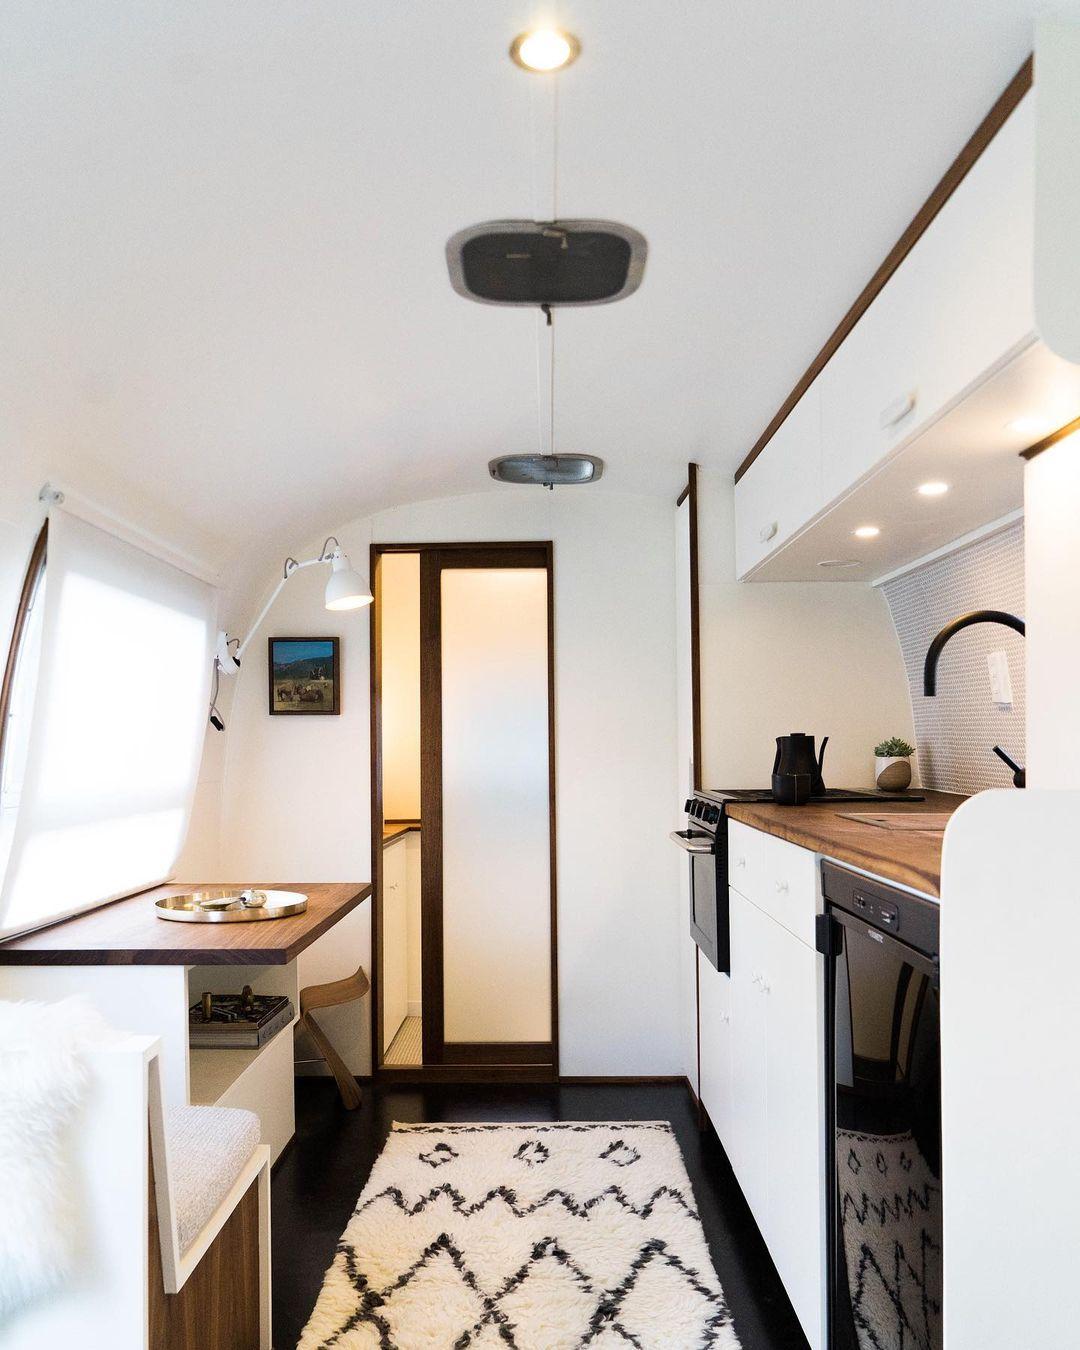 Airstream trailer Haus 1 - Interior designer turned heirloom Airstream into delightful home